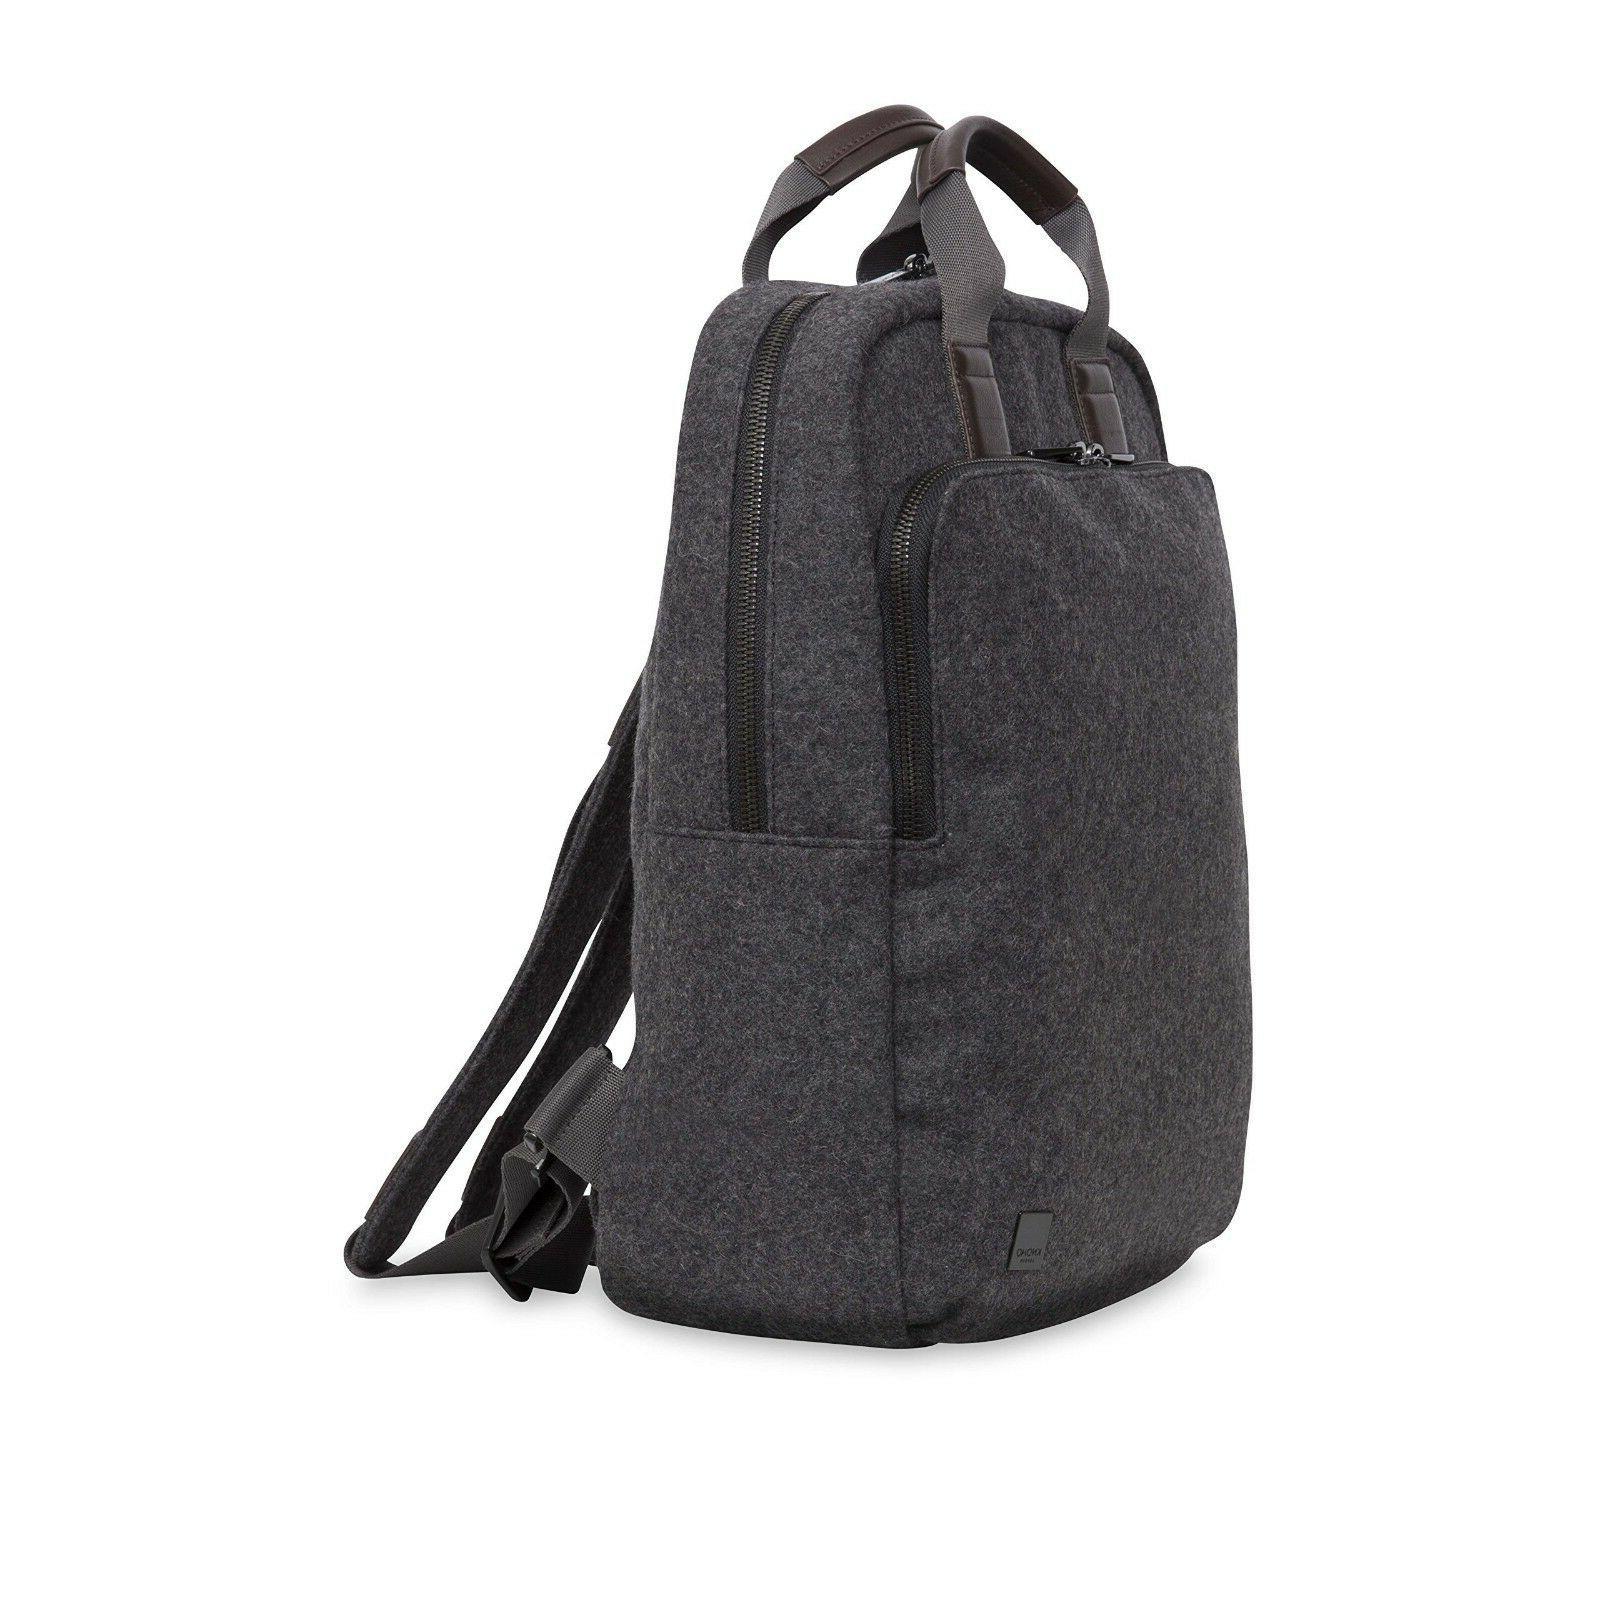 brompton james tote backpack felt 15 inch